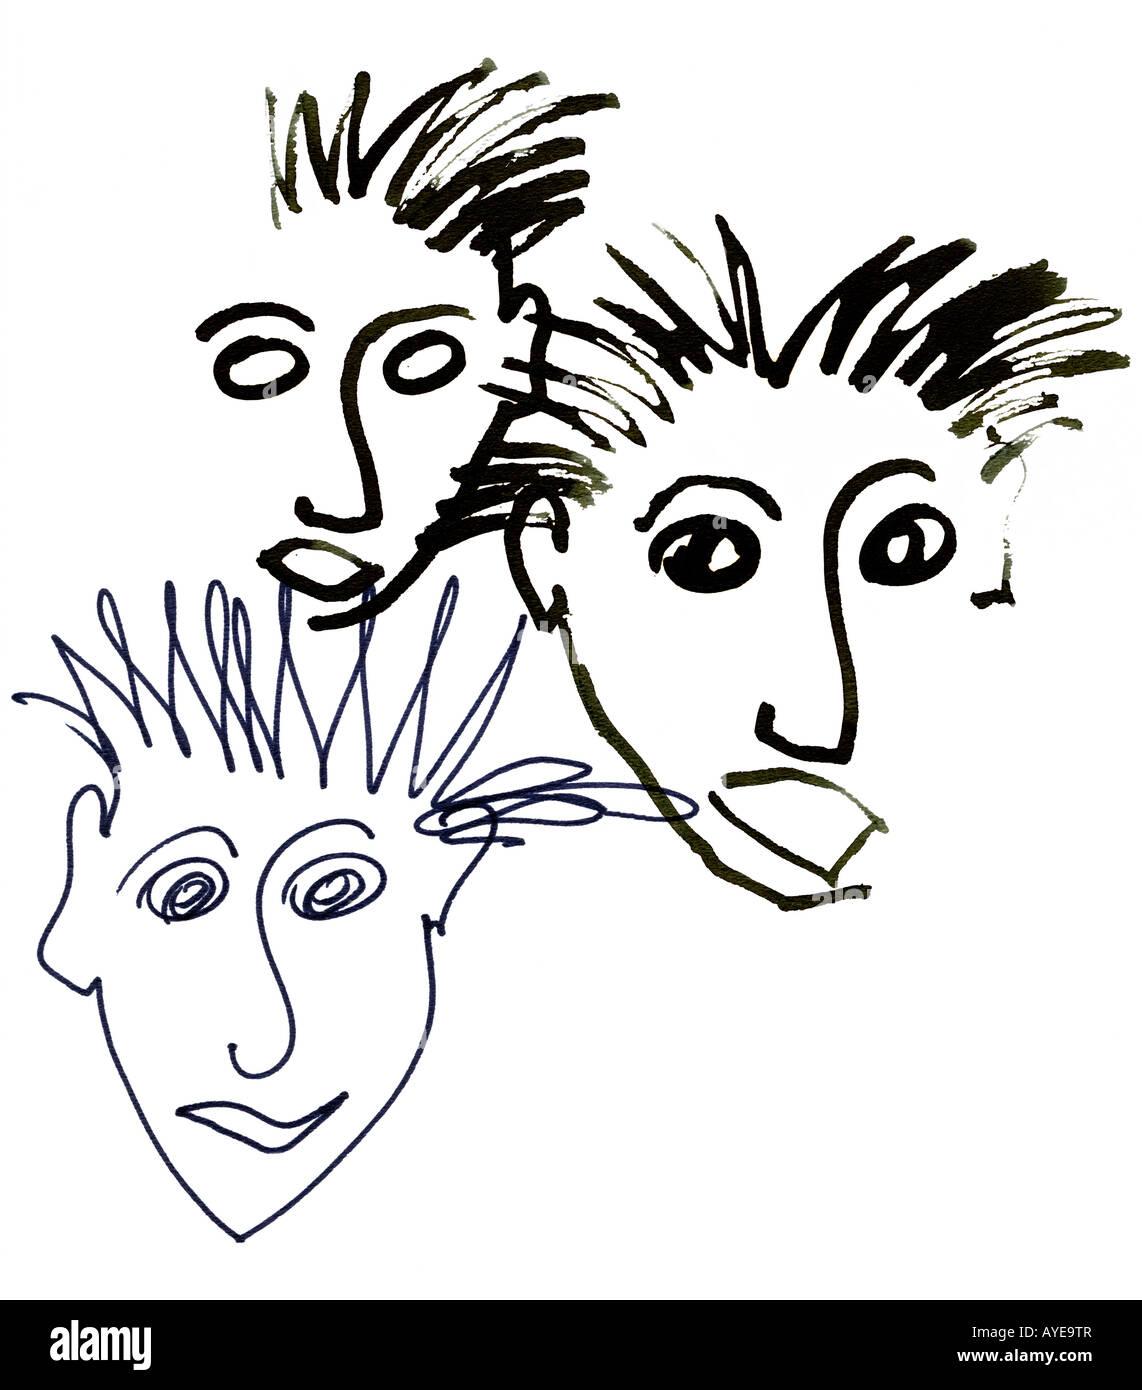 Graphic artwork - comic faces. - Stock Image